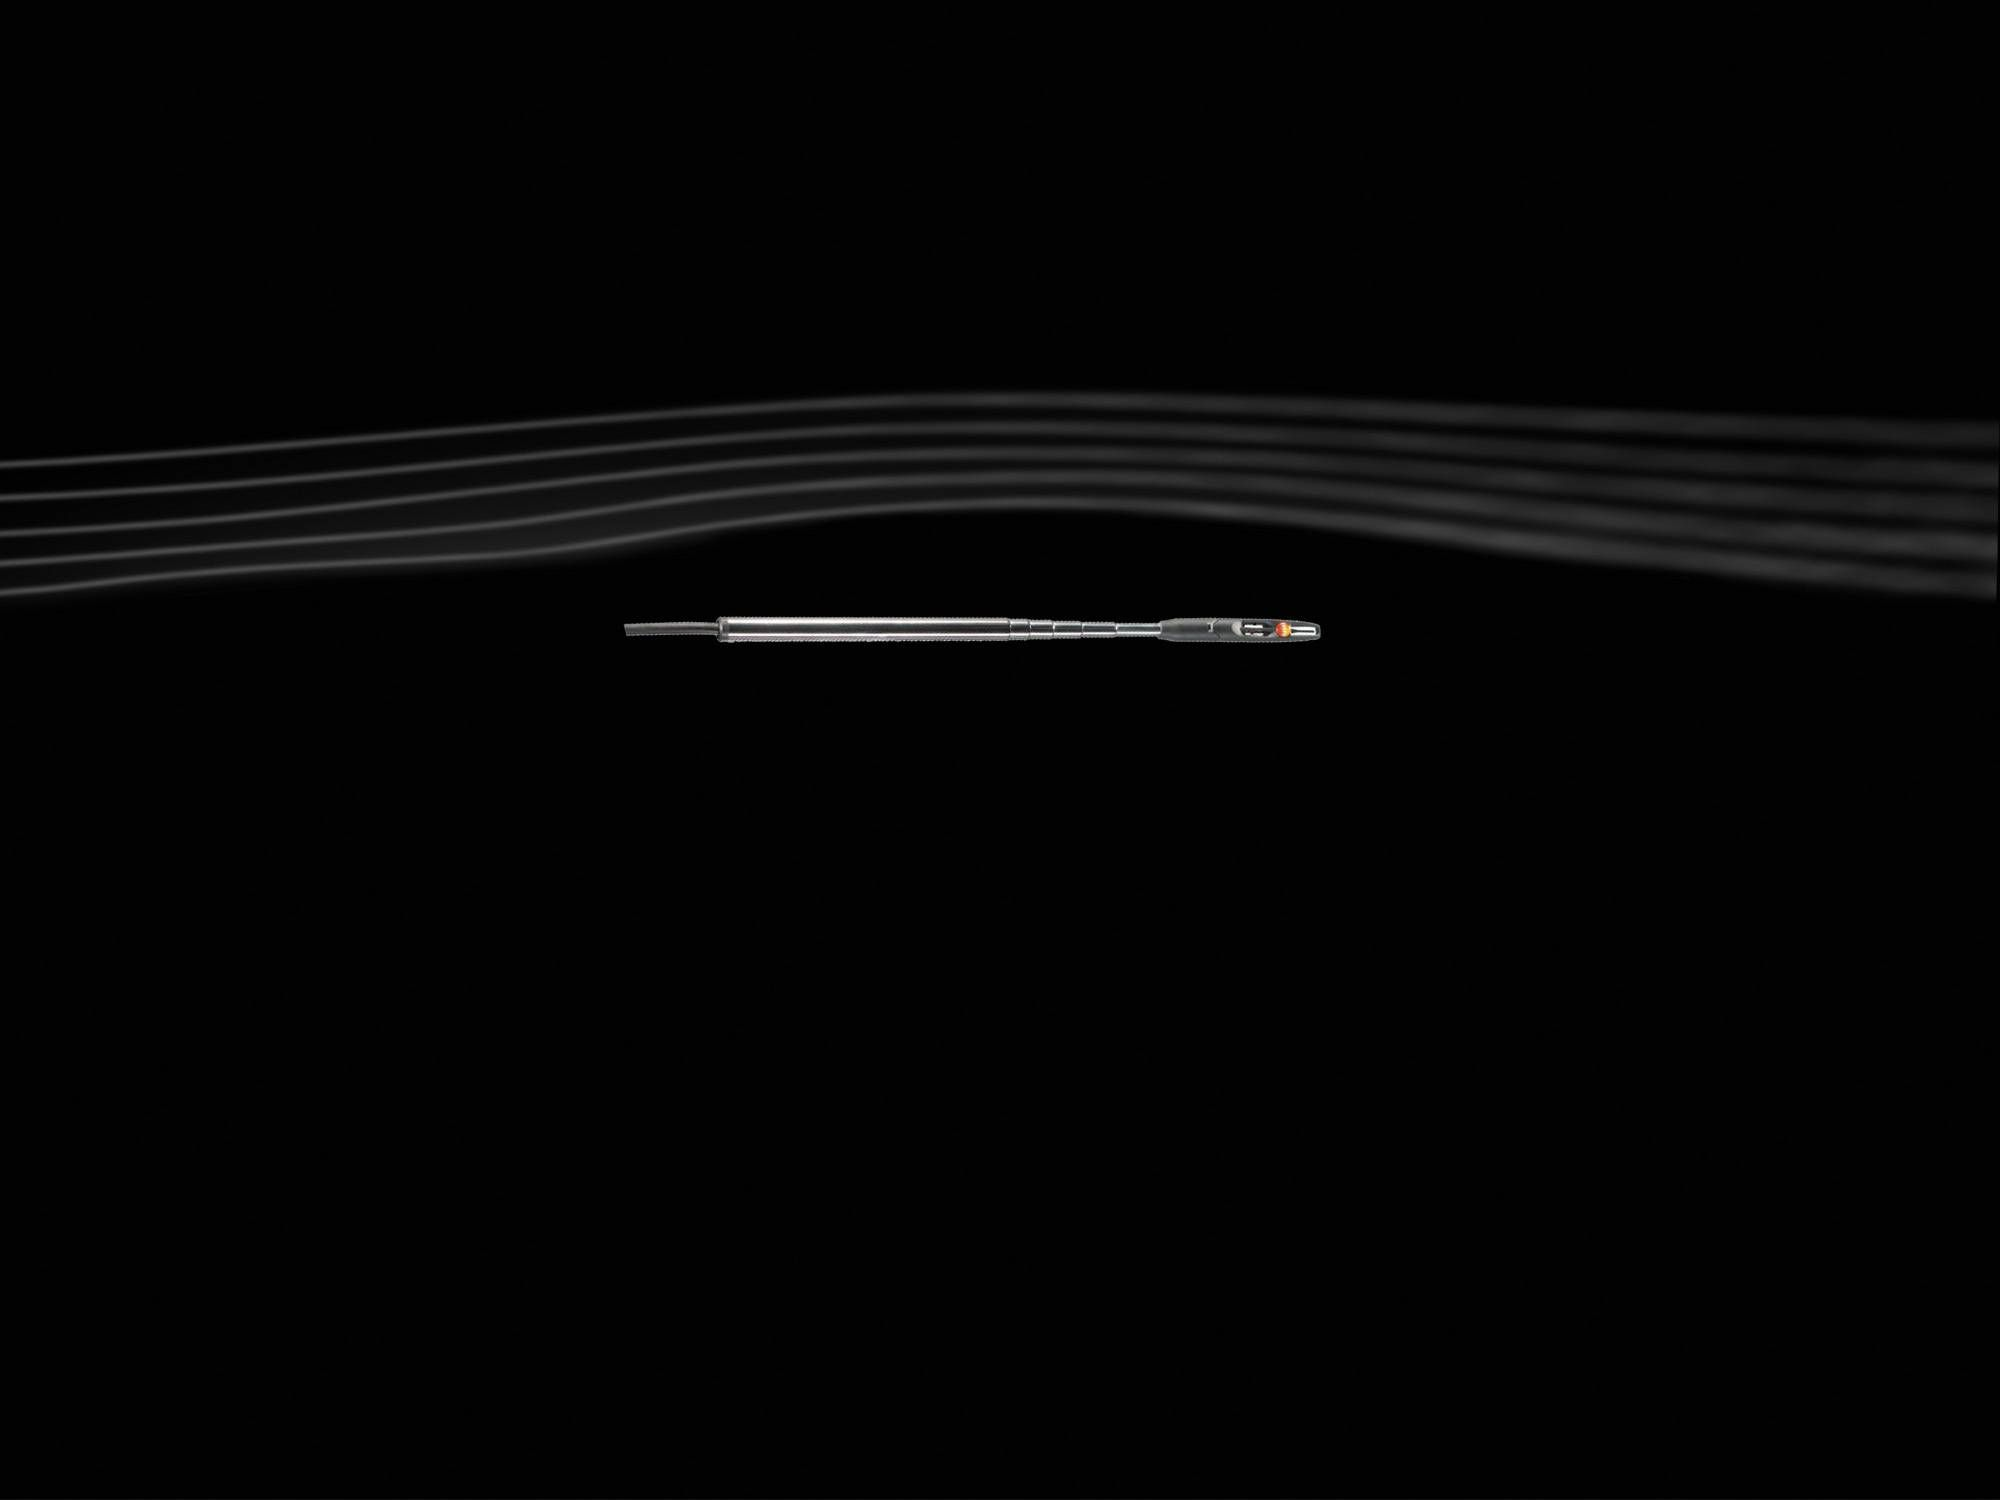 Sondă cu fir cald Ø 12 mm testo 435 -4.jpg